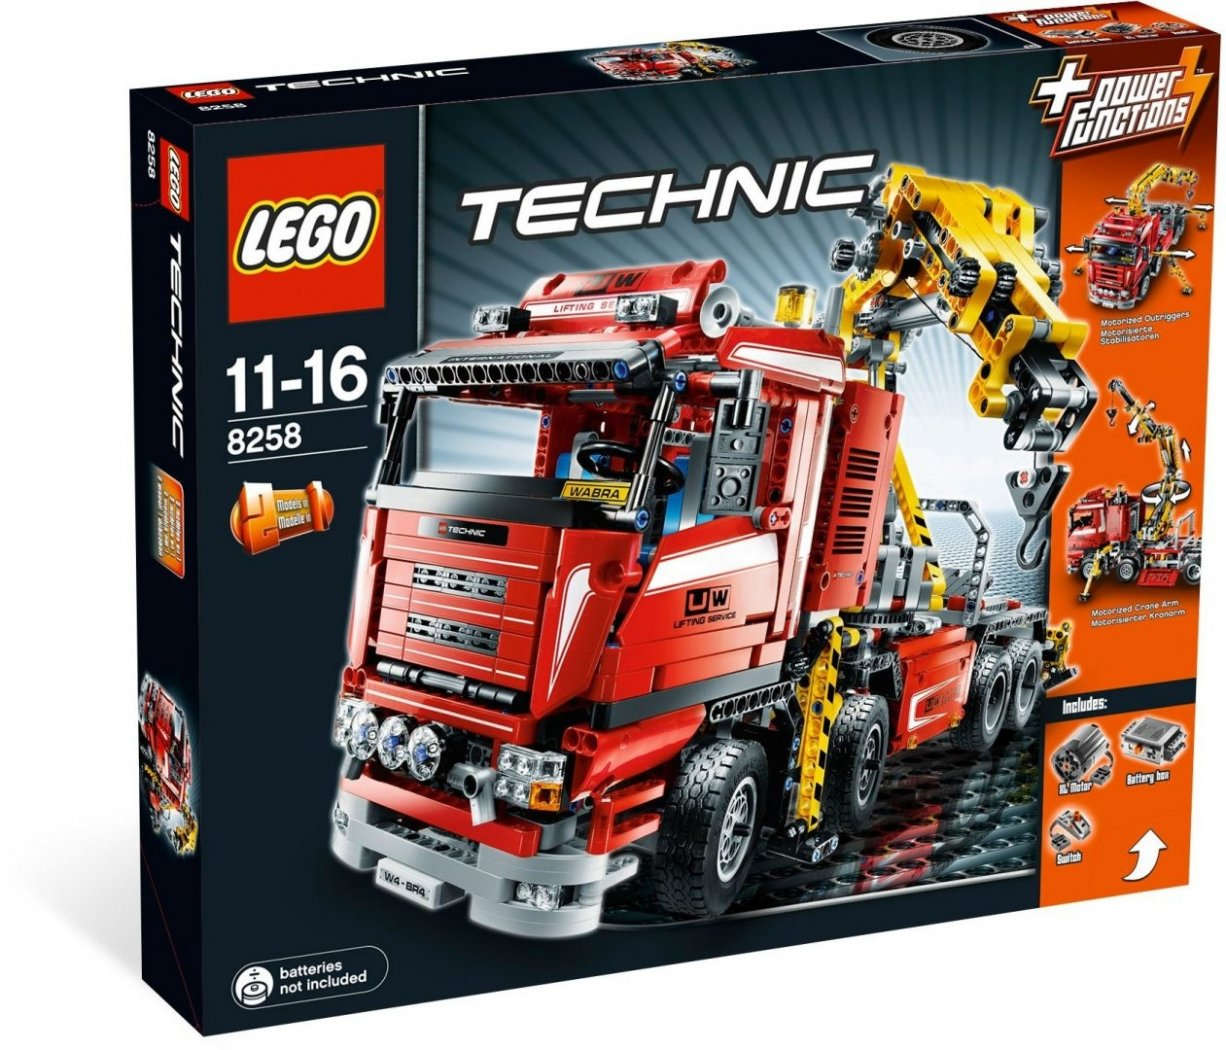 Lego Technic 8258 Nosturiauto Kaytetty